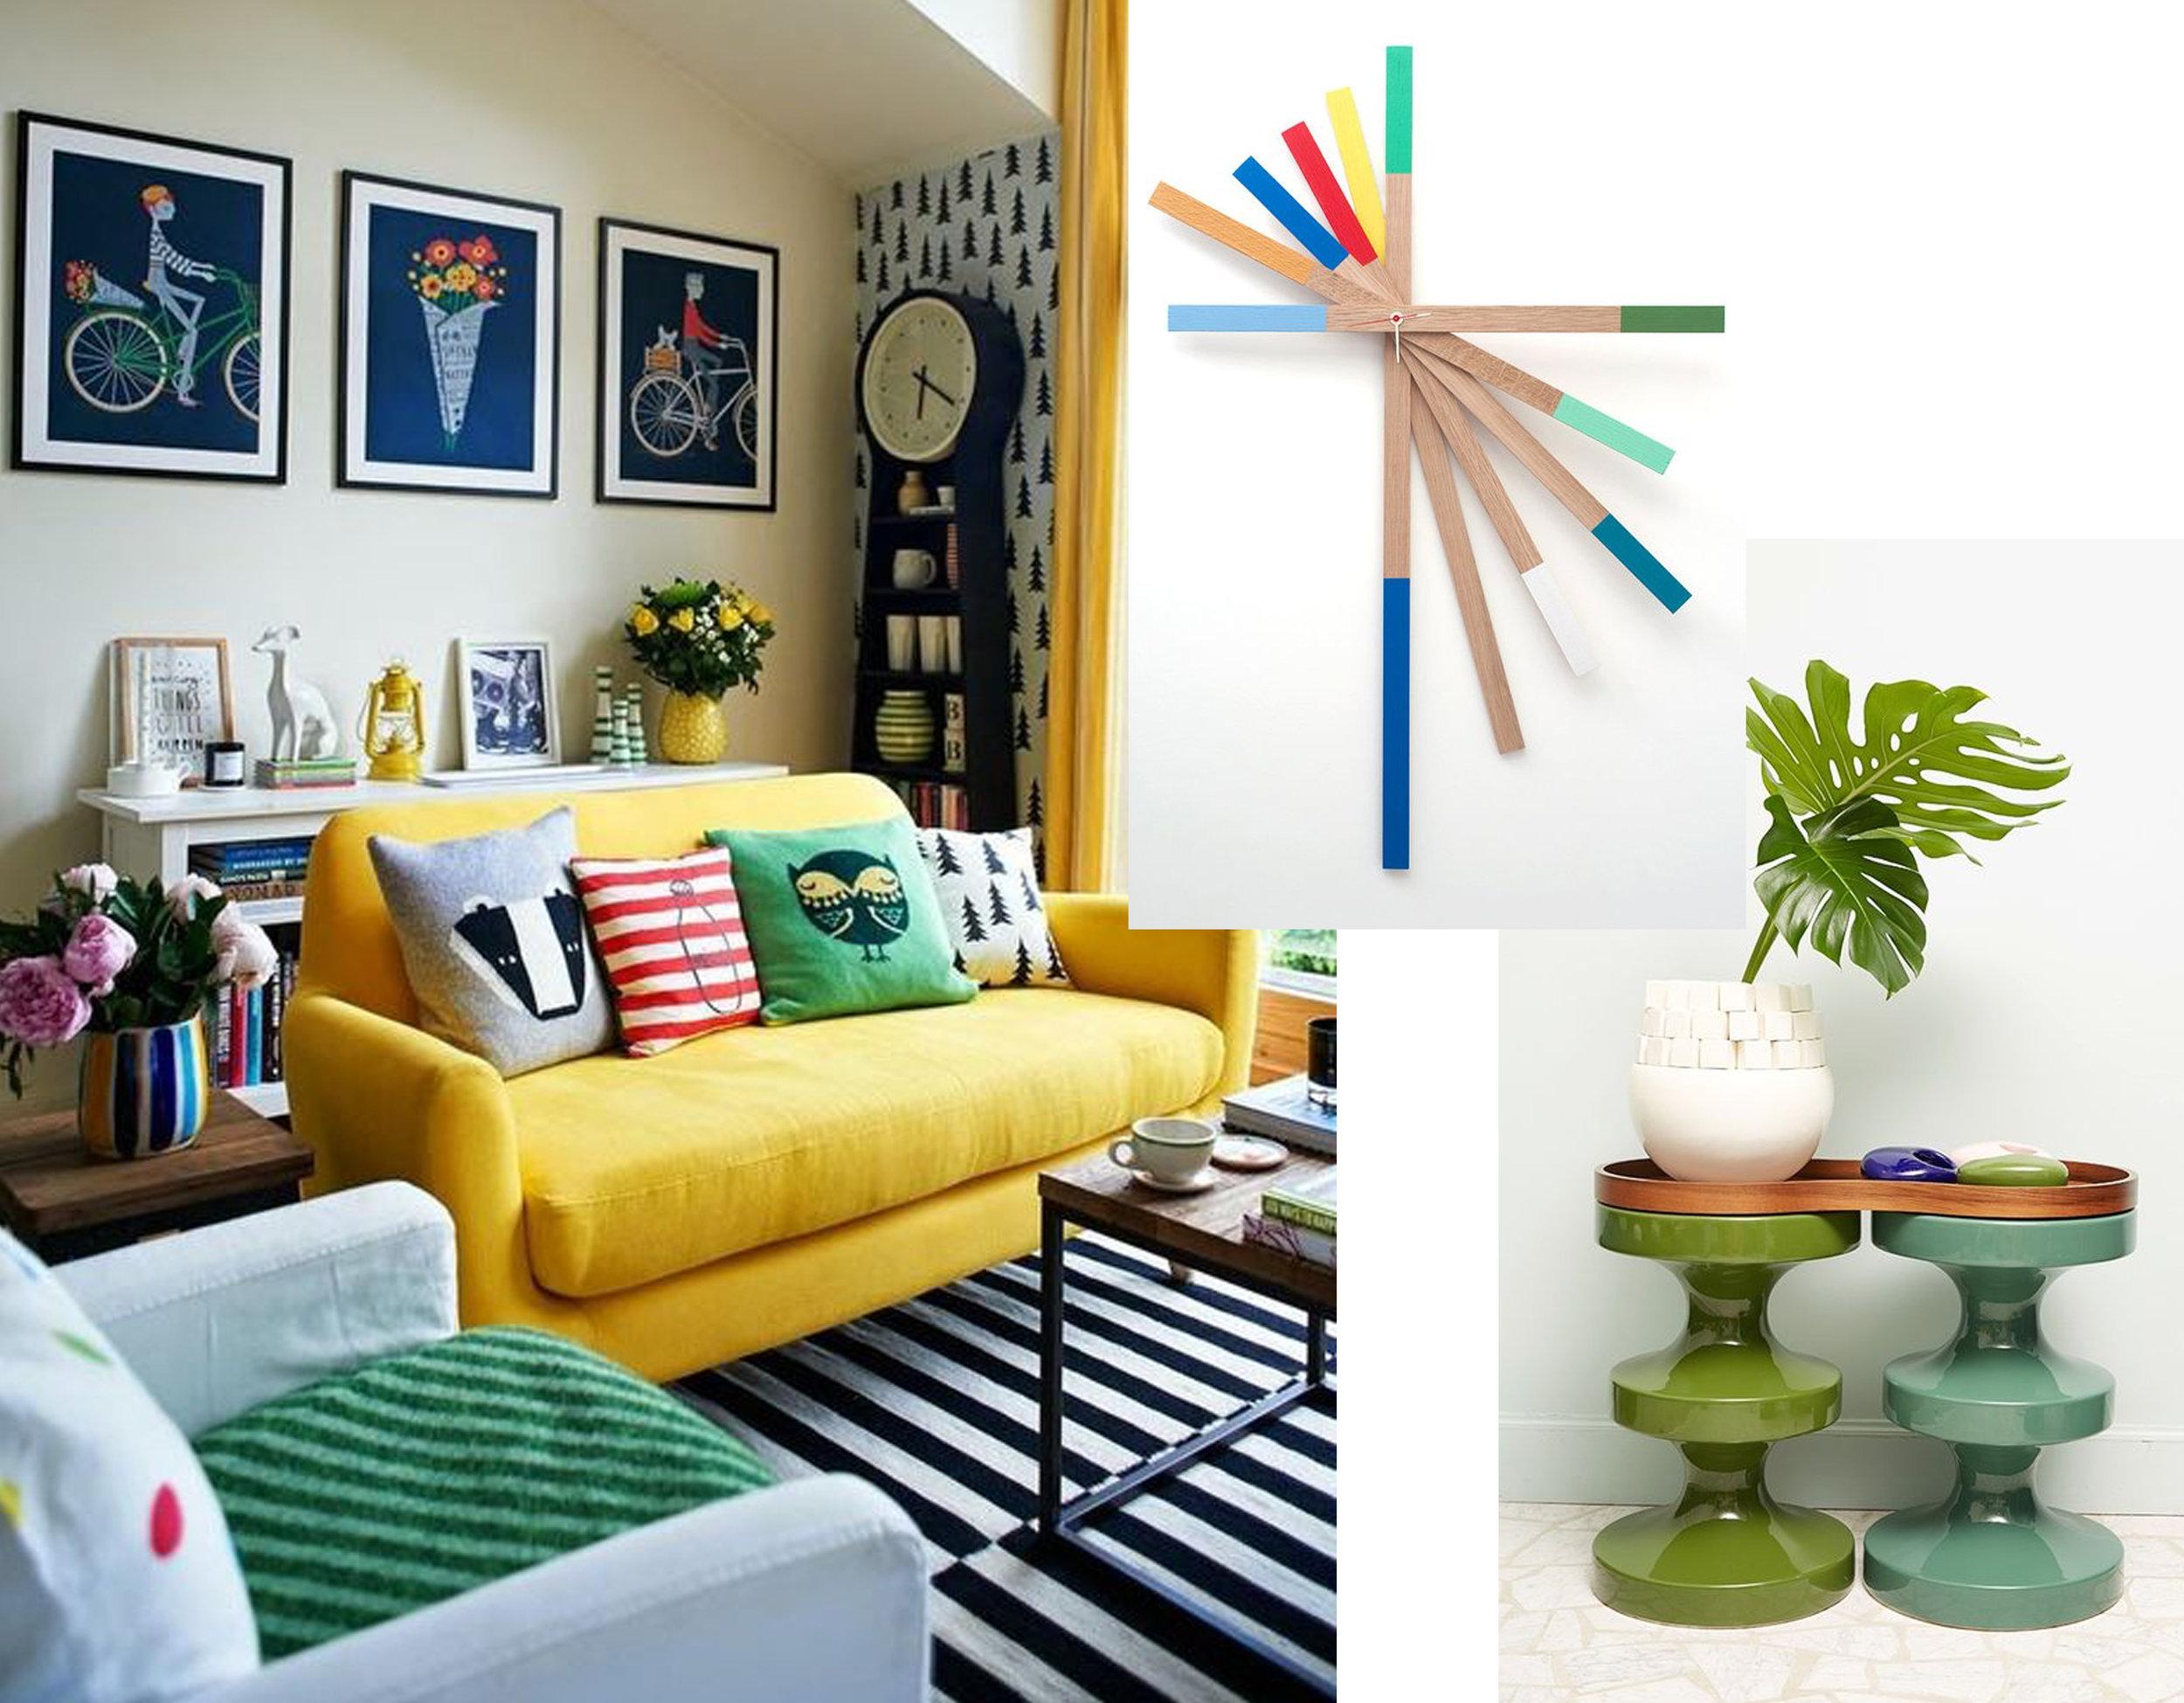 colorful interior via  Etxeko Deco  - Starburst Clock  Sennki  - Bishops Stools Inda Madhavi via  Interior Design